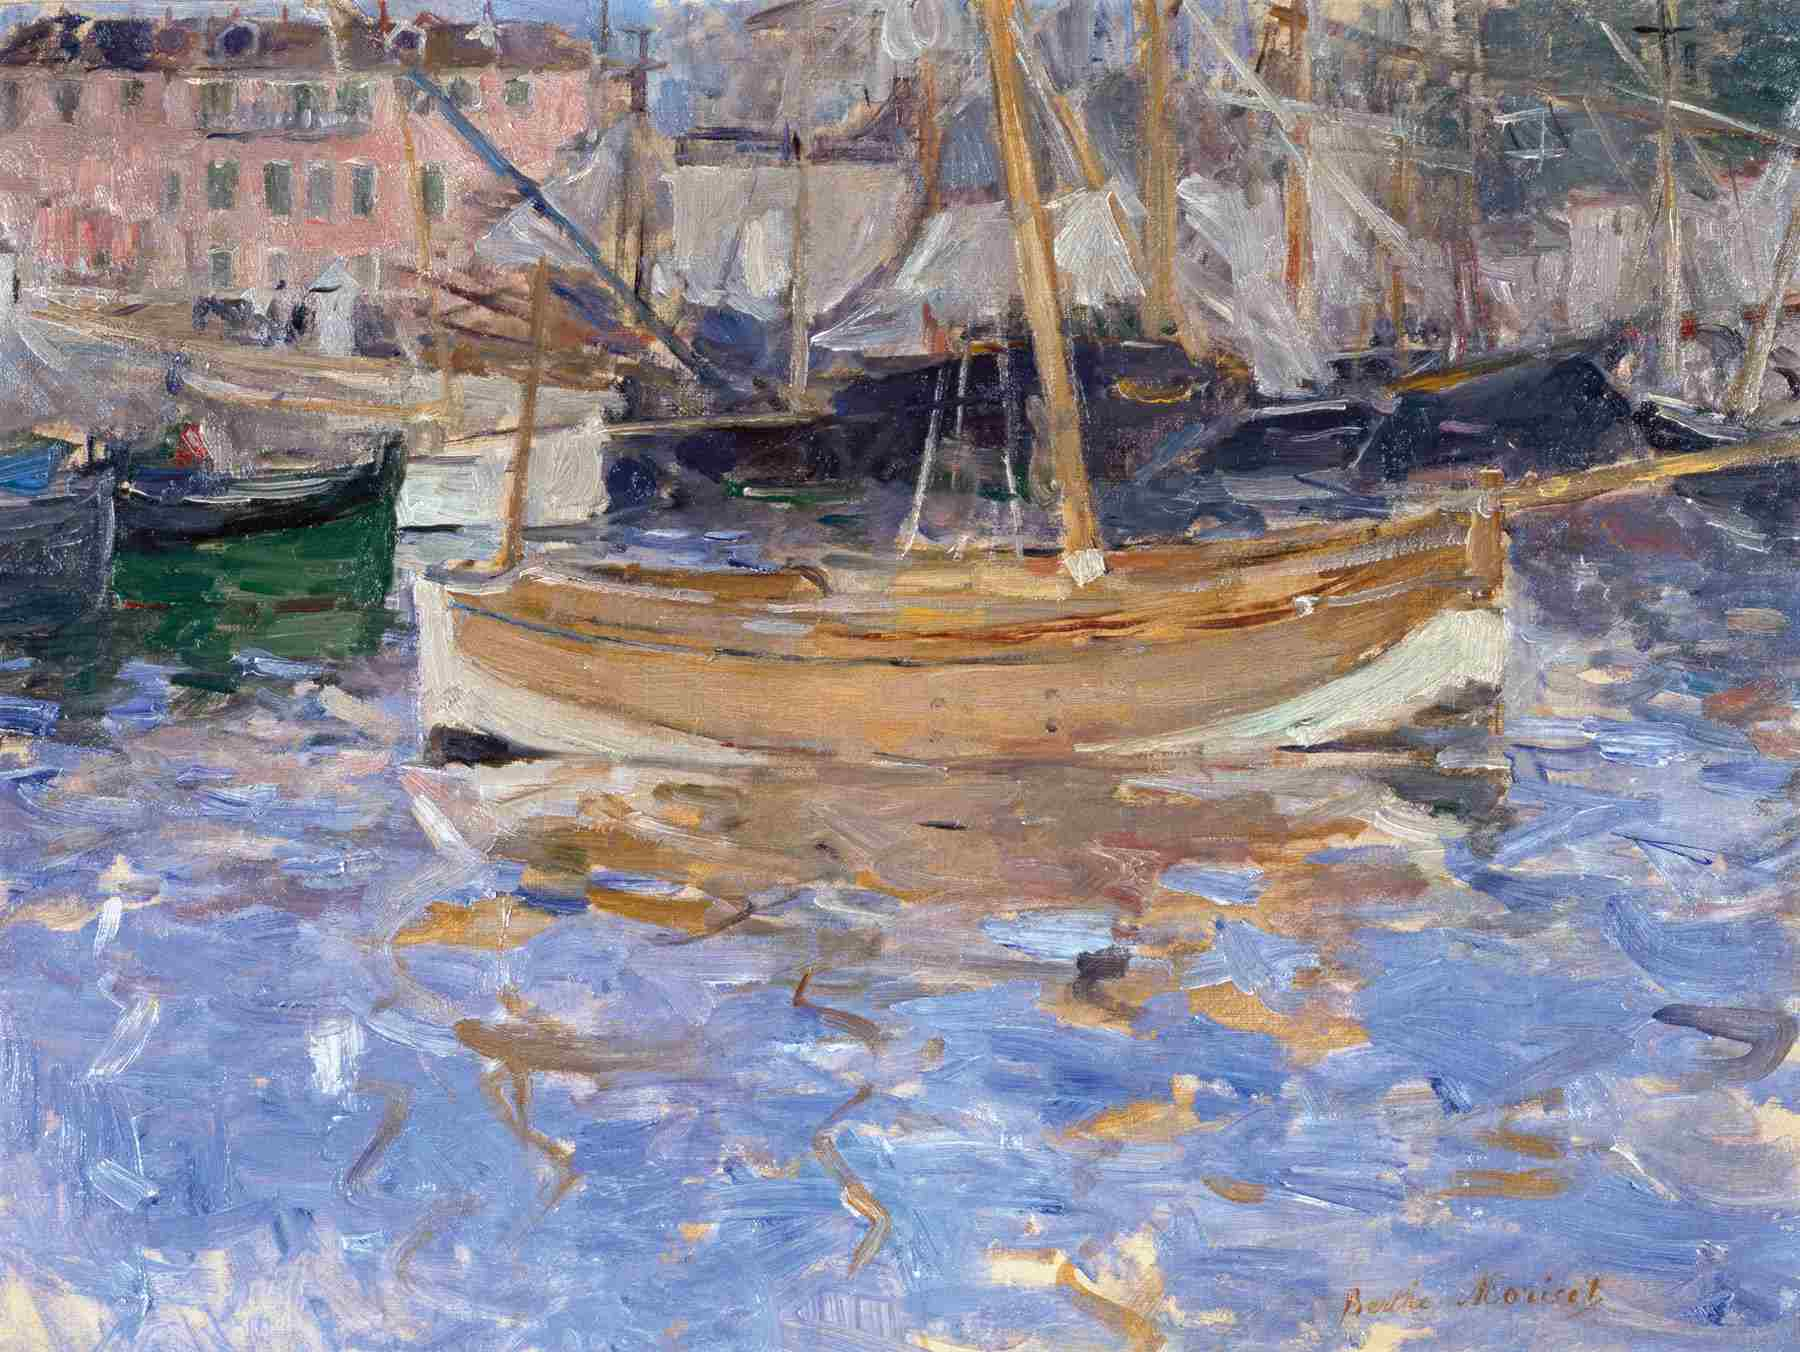 Berthe Morisot (French, 1841-1895). The Harbor at Nice, 1881-82. Oil on canvas. 41.4 cm x 55.3 cm (16 1/4 x 21 3/4 in.). Wallraf-Richartz-Museum & Fondation Corboud, Köln.